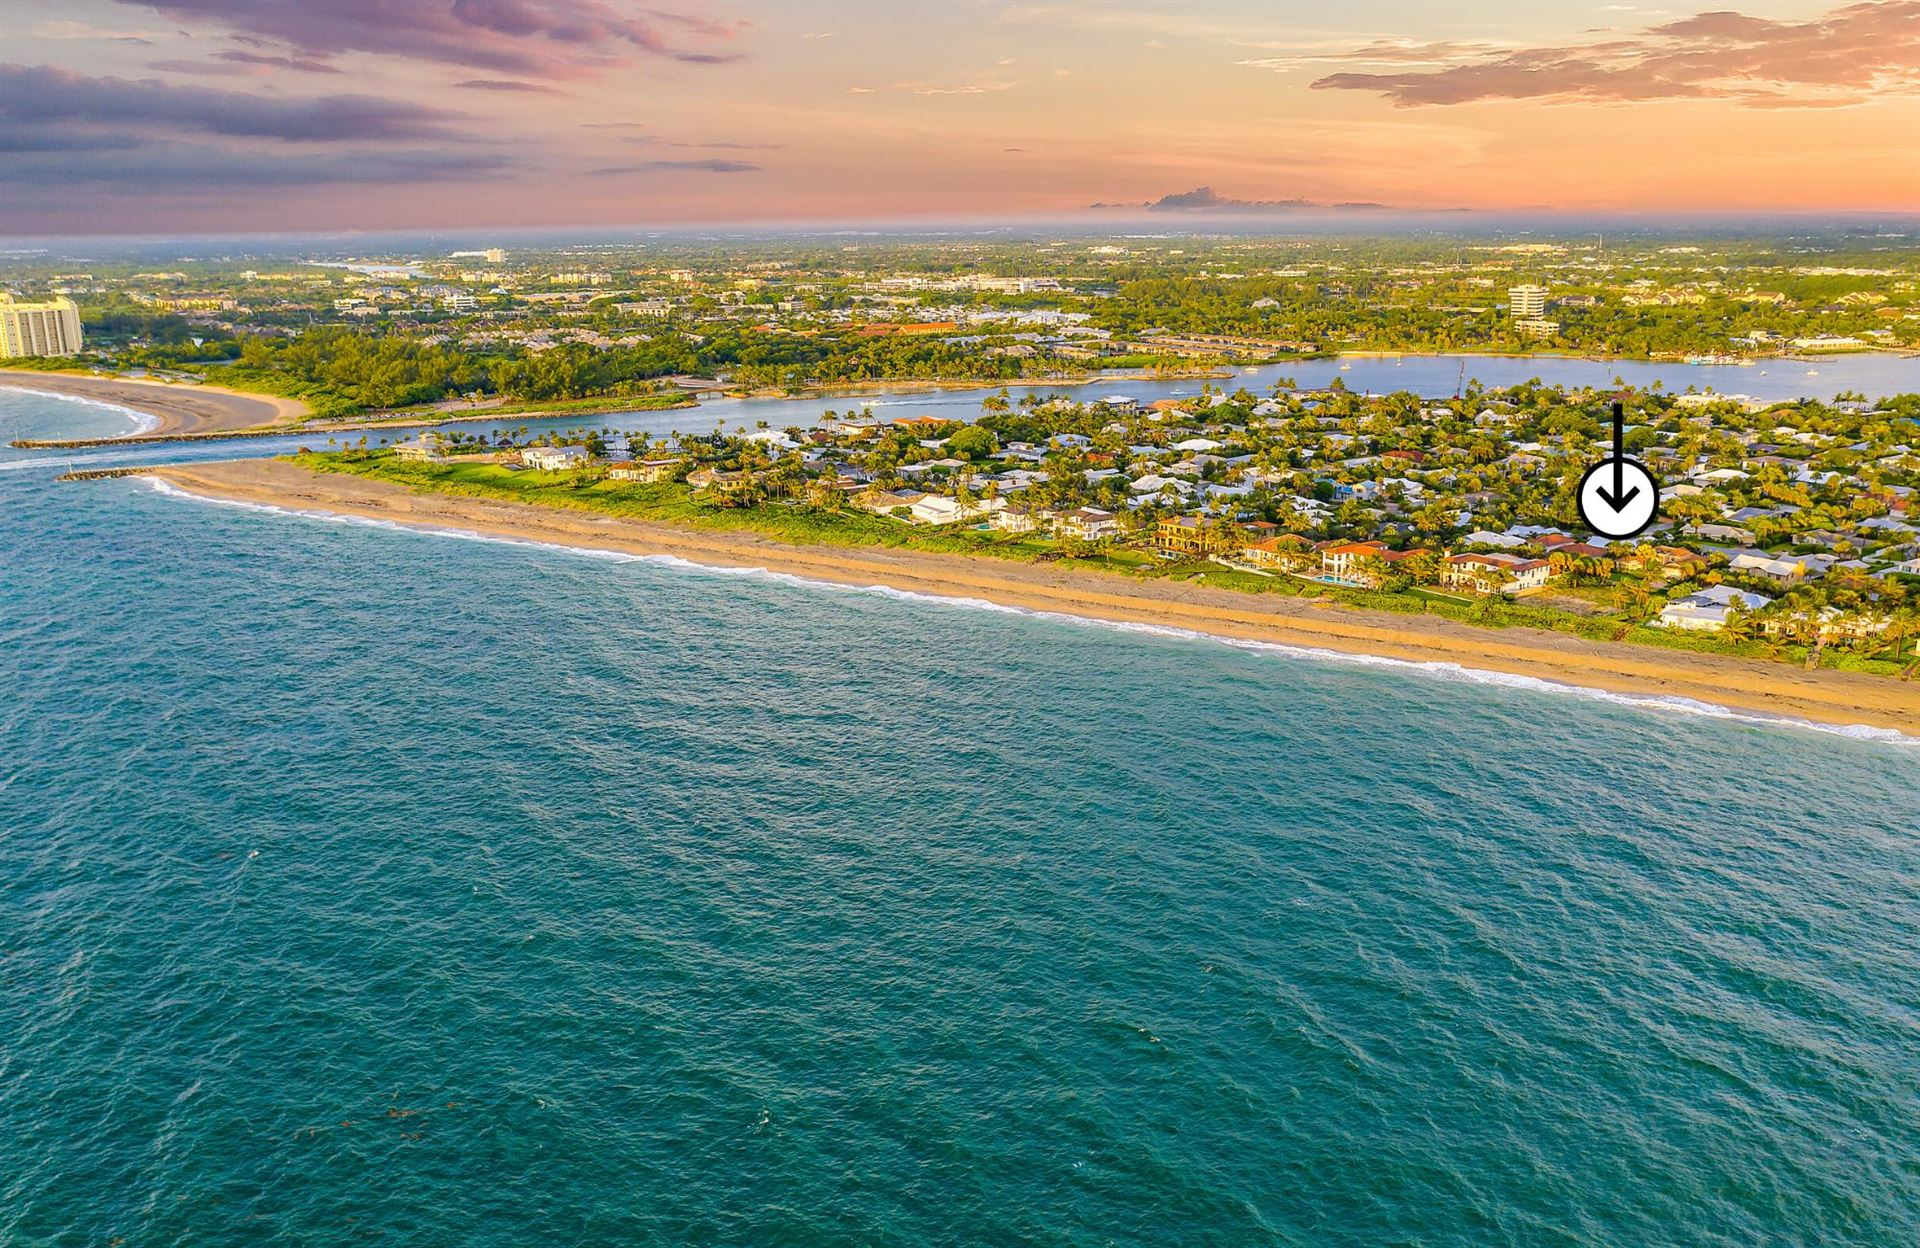 Photo of 12 Ocean Drive, Jupiter Inlet Colony, FL 33469 (MLS # RX-10645405)